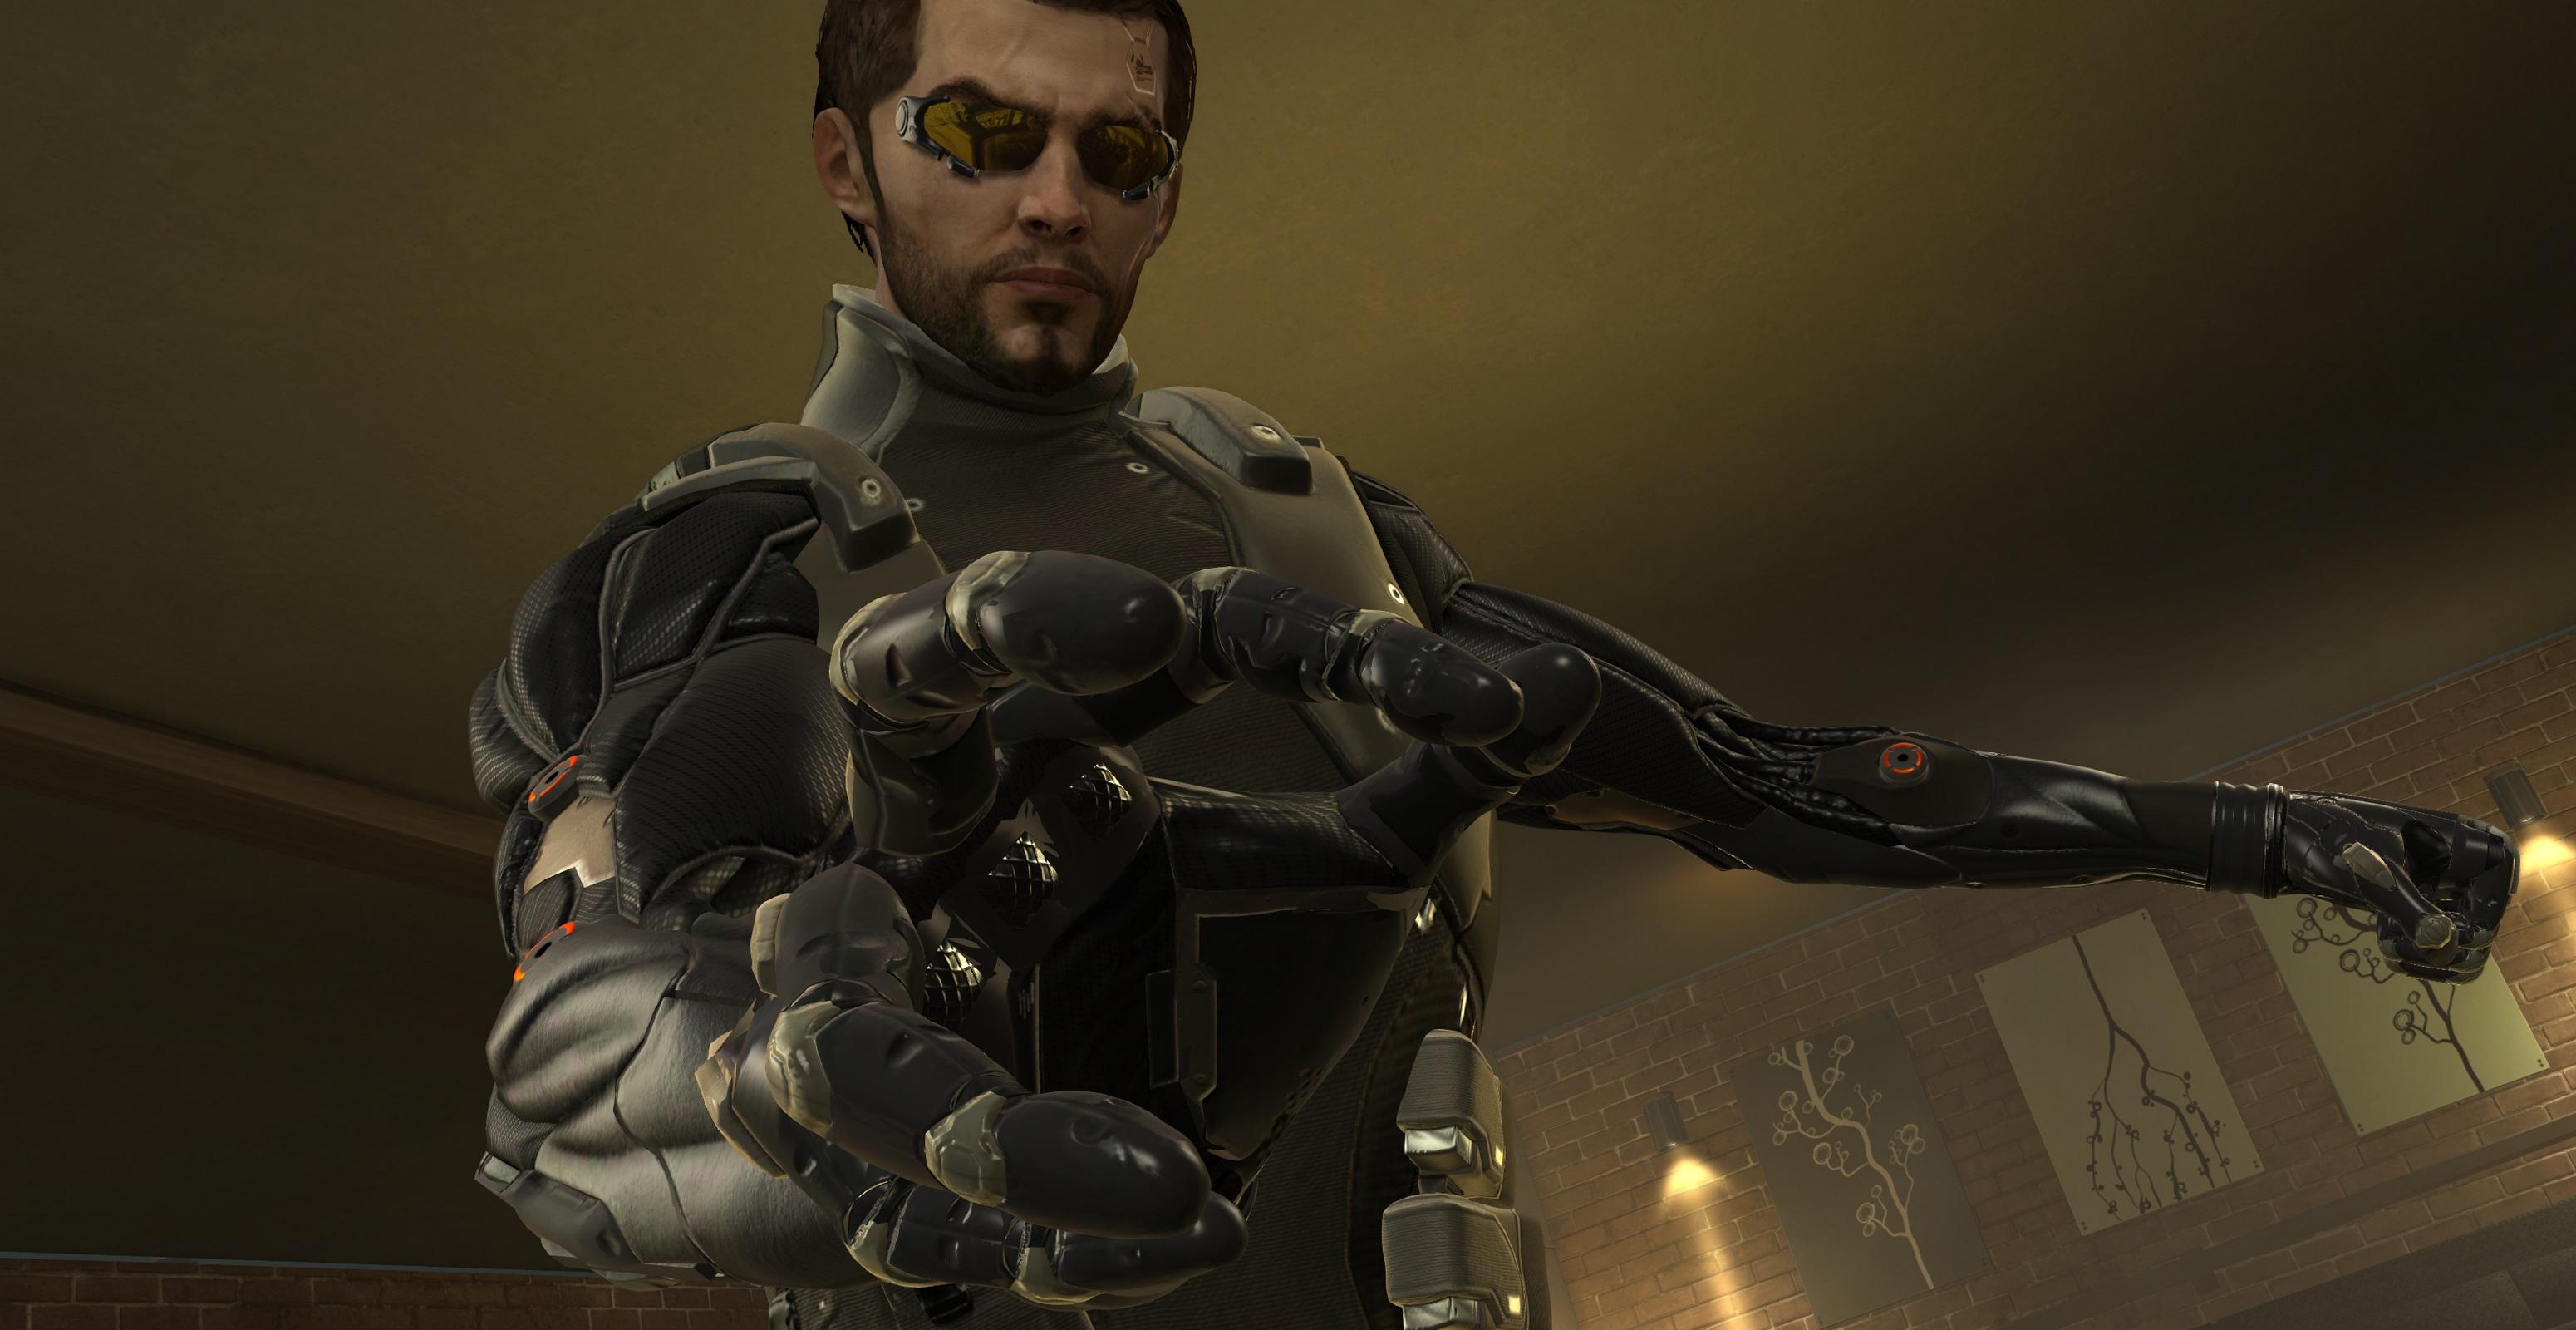 Deus Ex: Human Revolution:Director's Cut - Deus Ex: Human Revolution